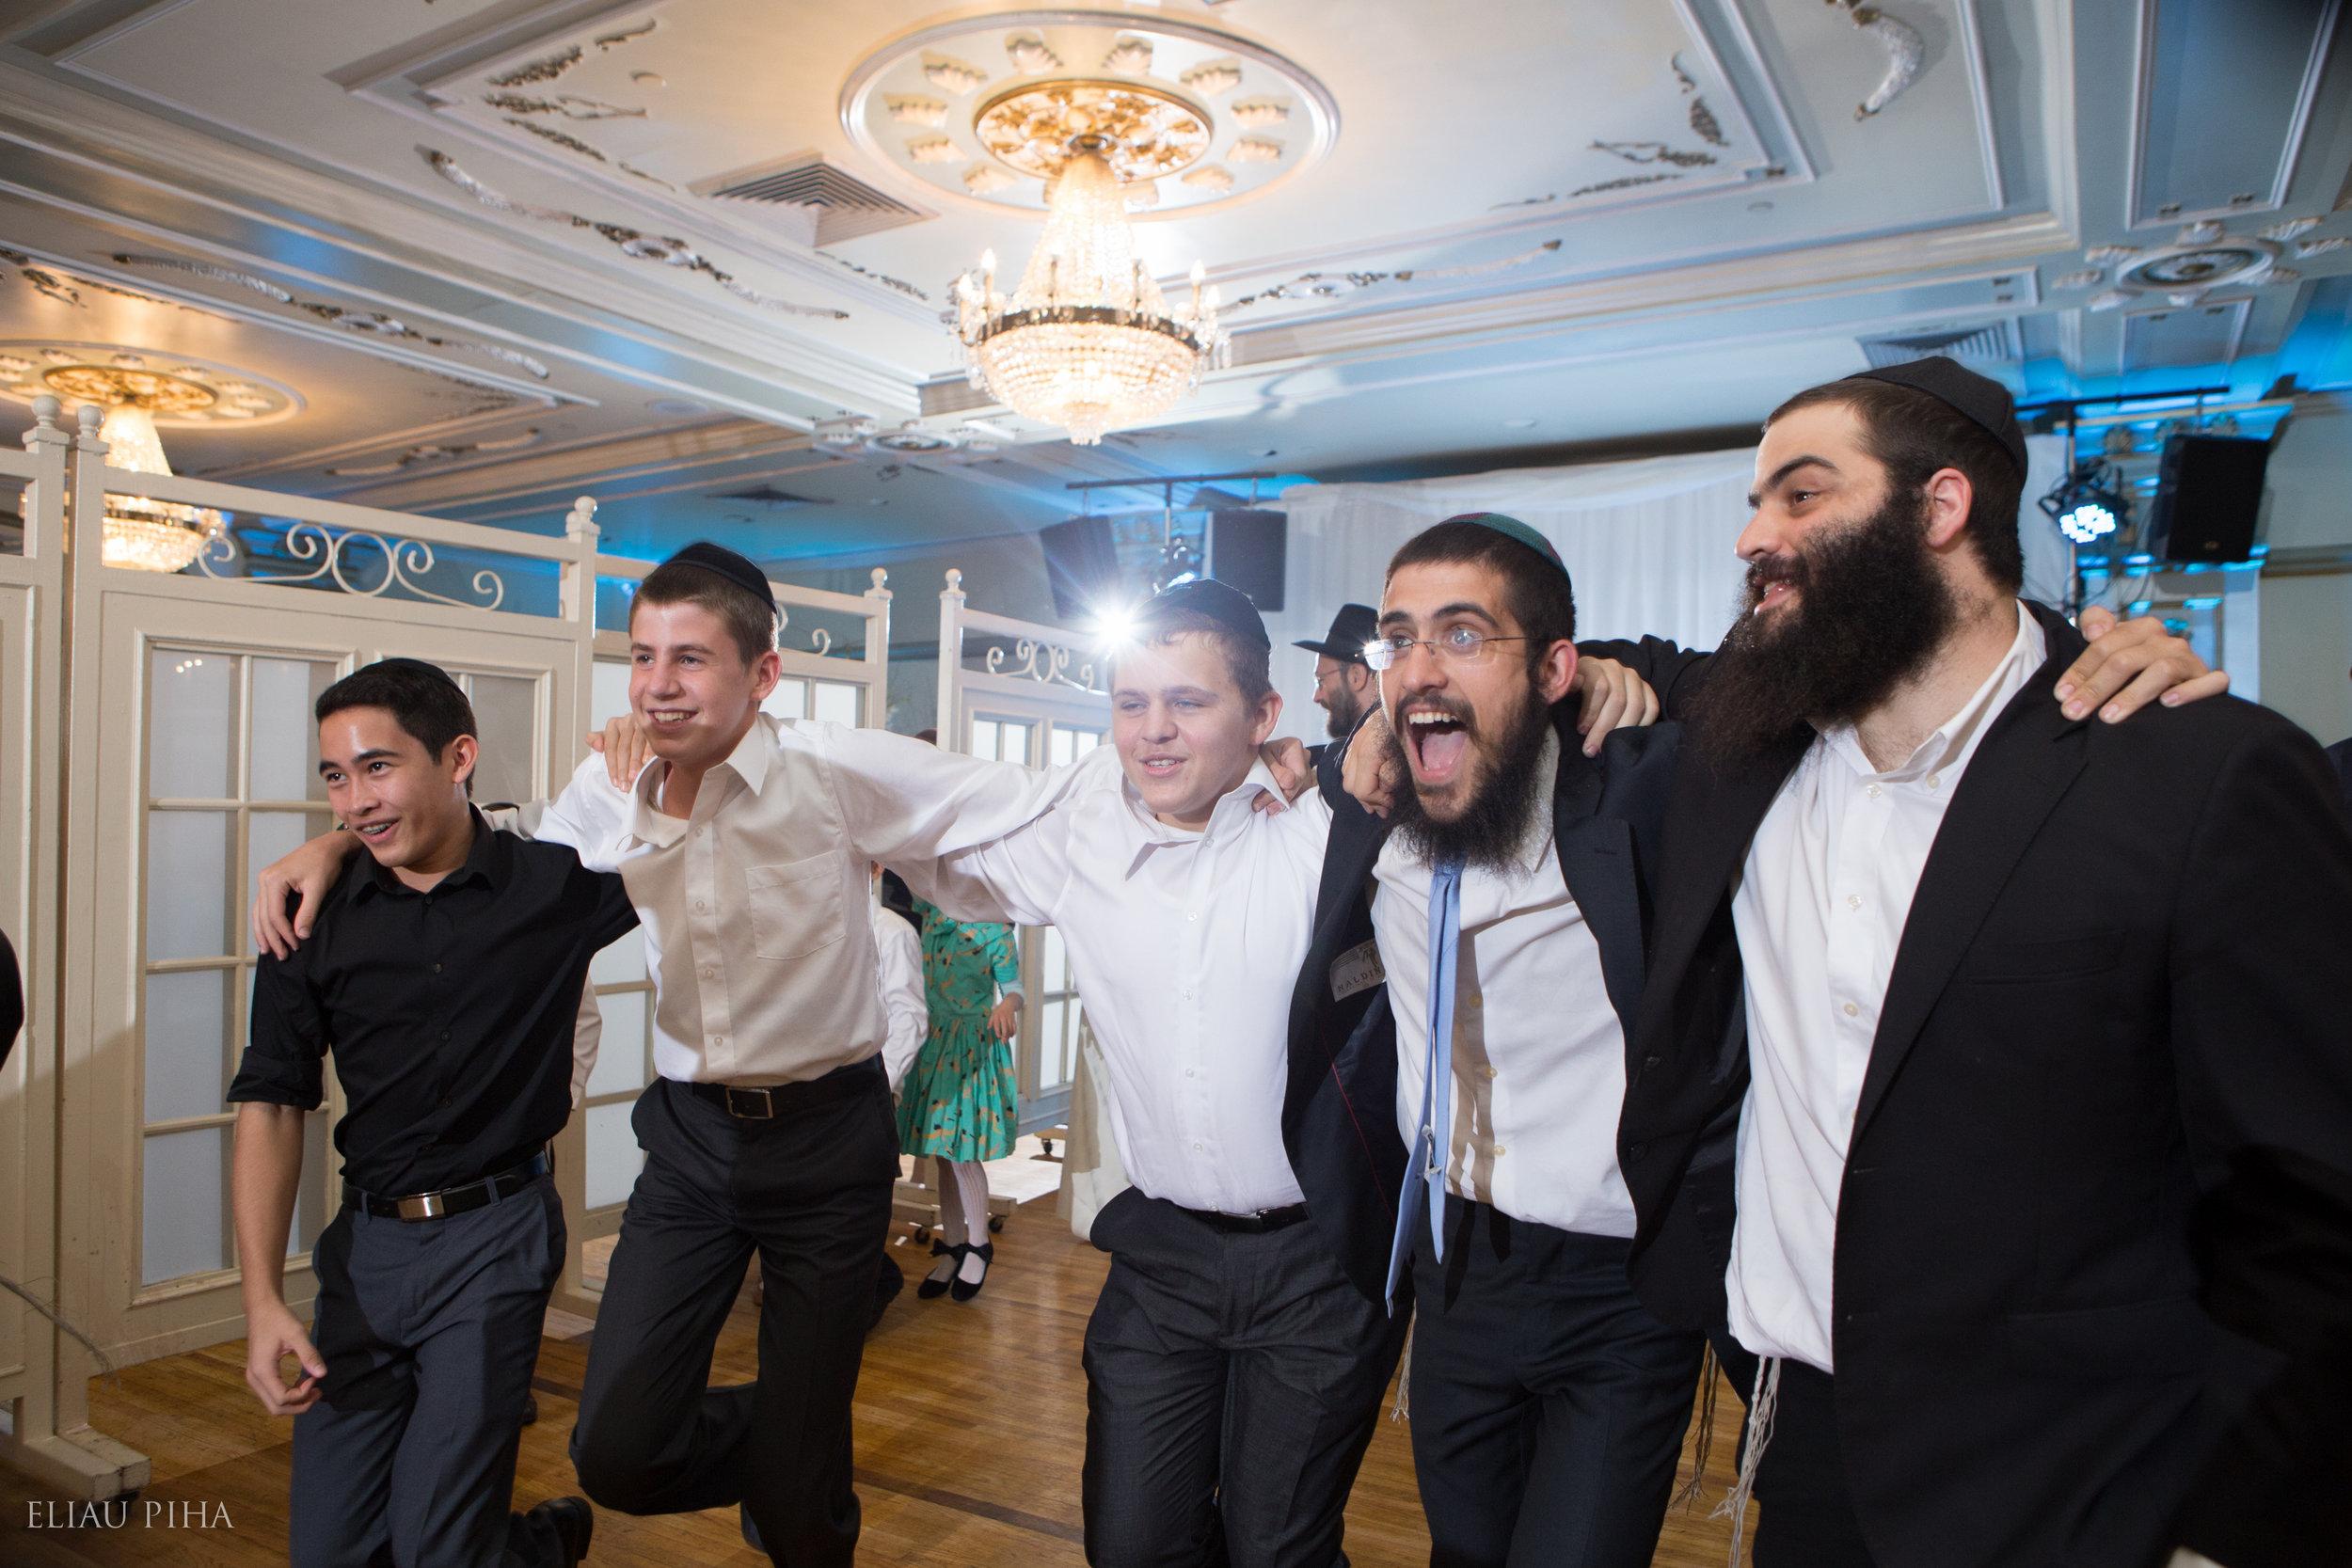 Bar Mitzvah Meir Sandman - photography, new york, events, people -0371.jpg